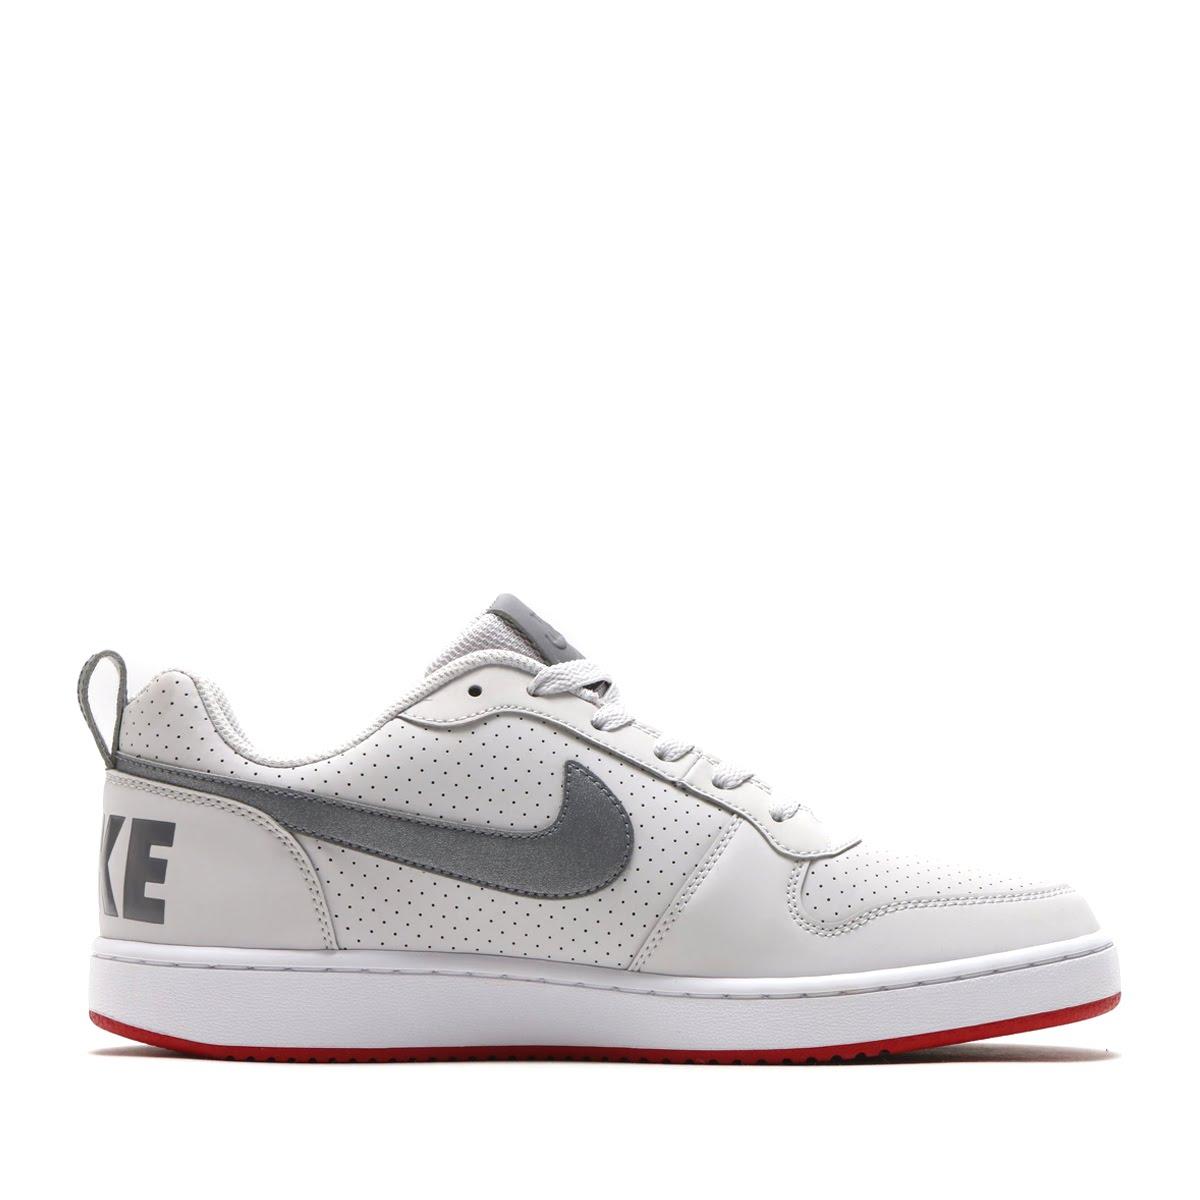 cdb287206435 NIKE COURT BOROUGH LOW SL (Nike coat Barlow low SL) VAST GREY MTLC COOL GREY -GYM RED 18SP-I